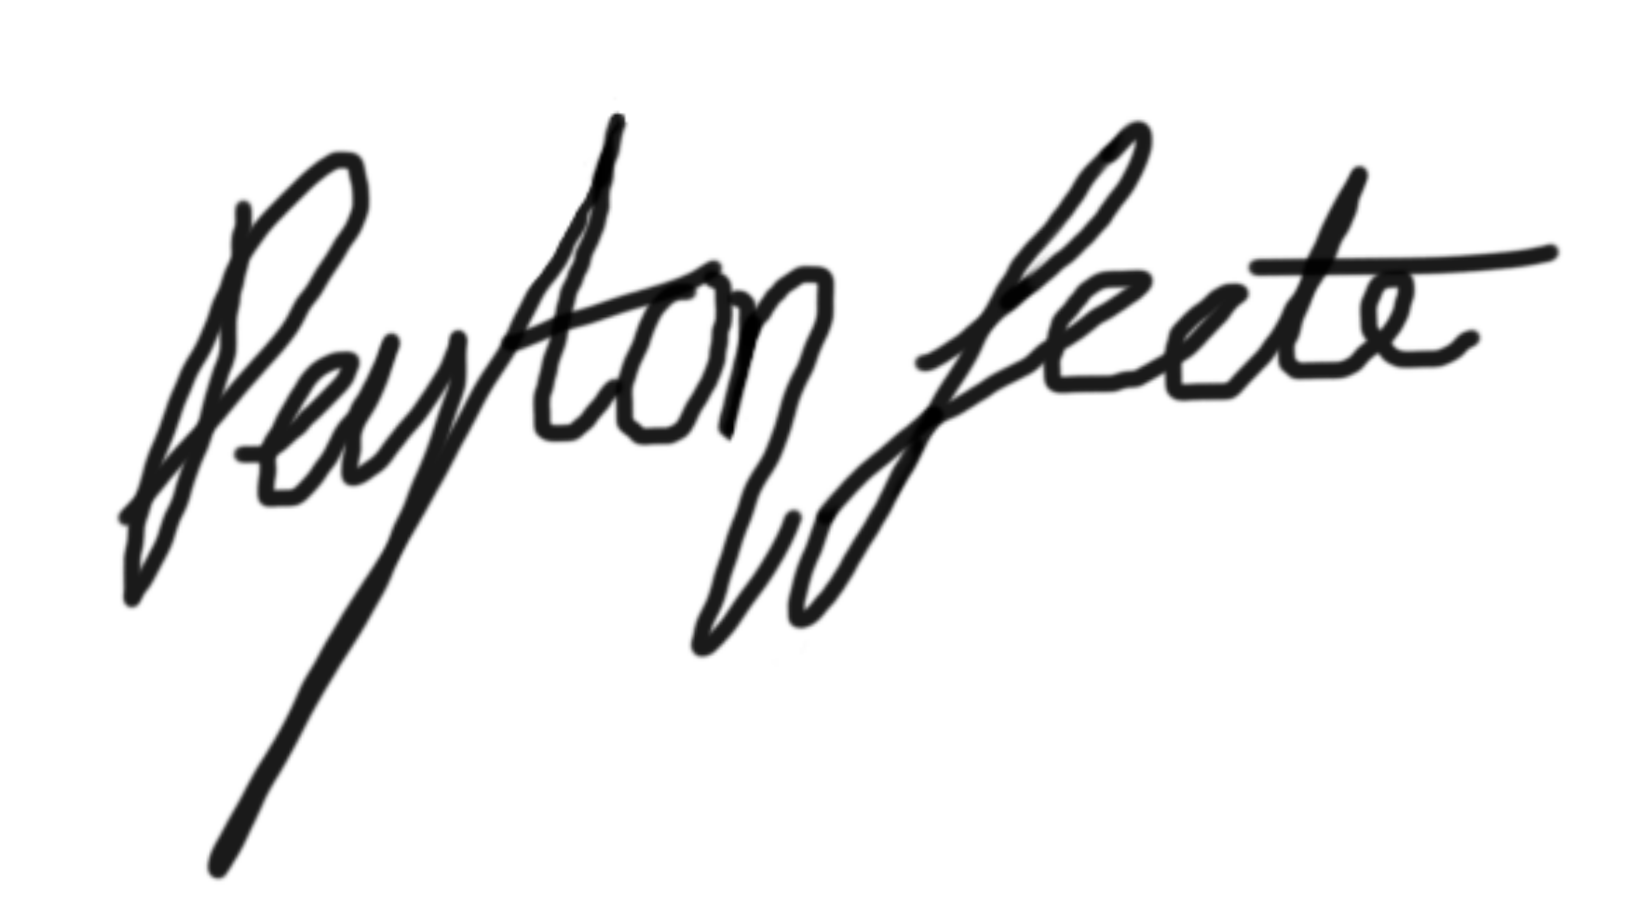 Peyton Leete Signature